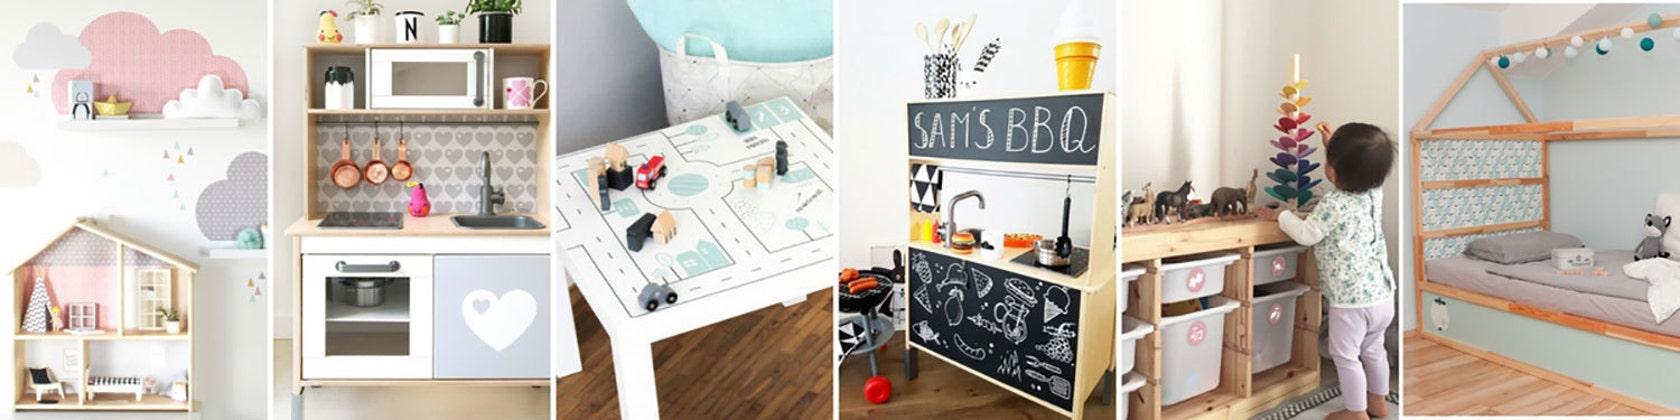 IKEA wall decor and furniture stickers por Limmaland en Etsy